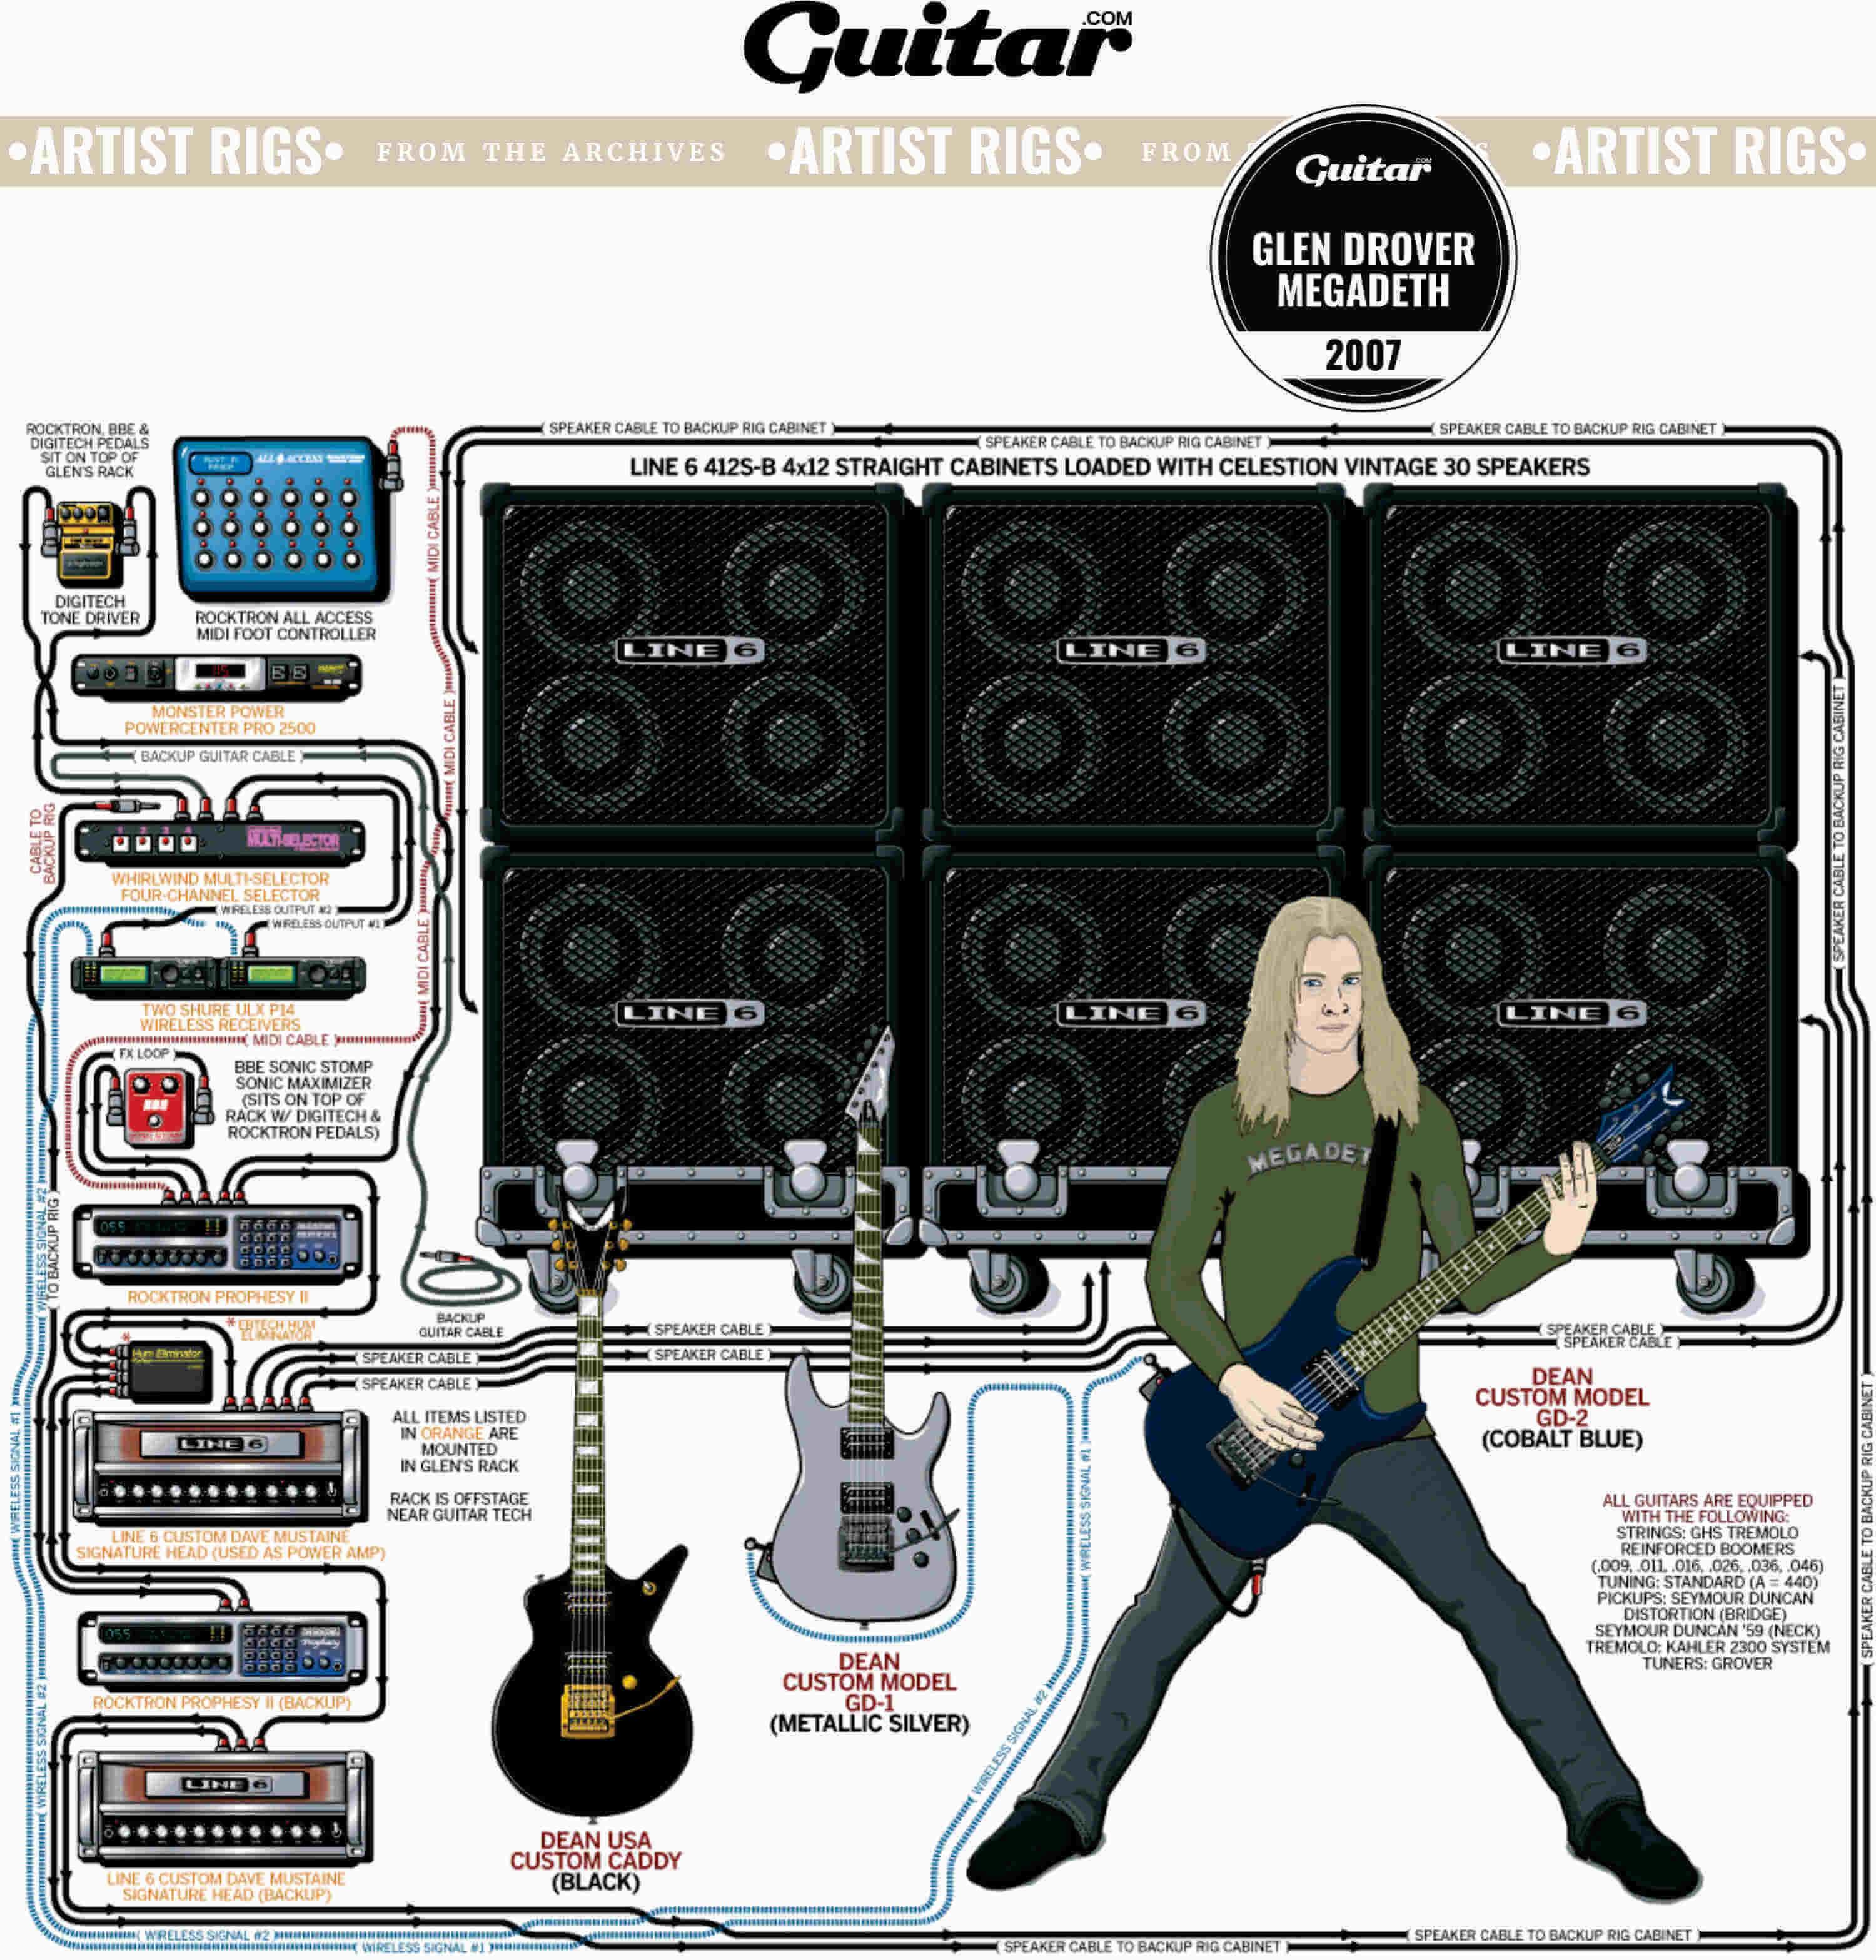 Rig Diagram: Glen Drover, Megadeth (2007)